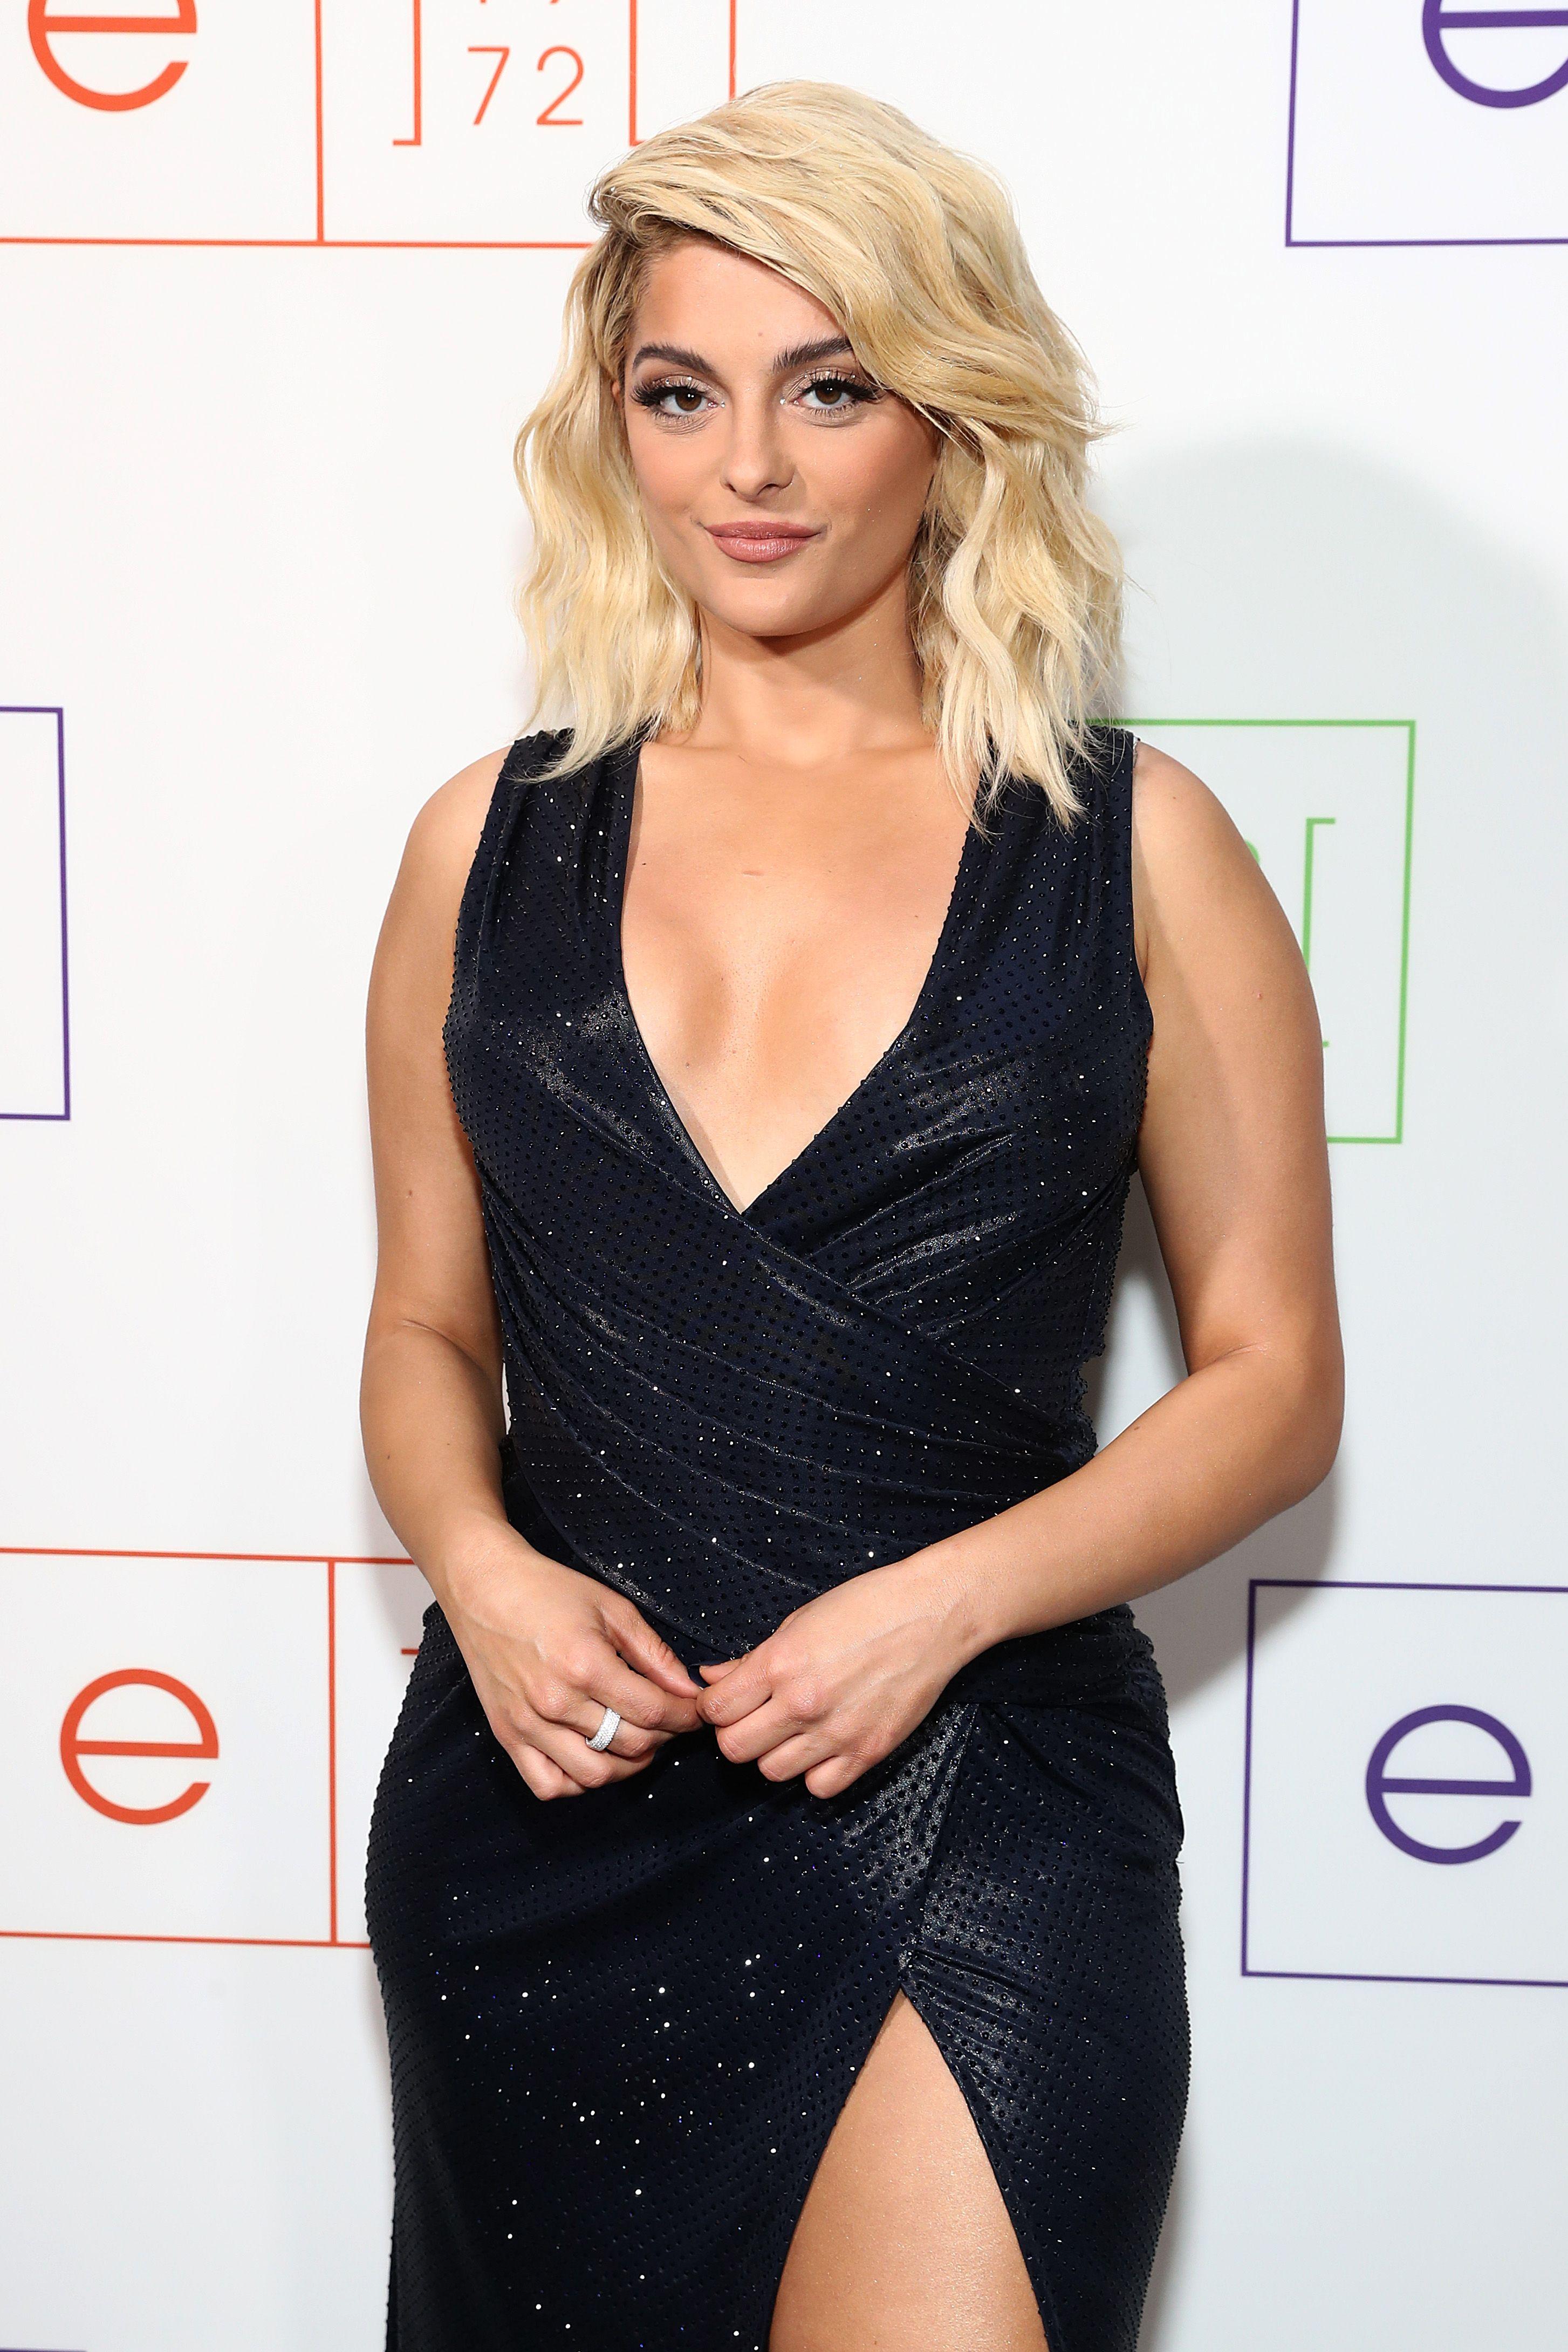 Bebe Rexha at an event